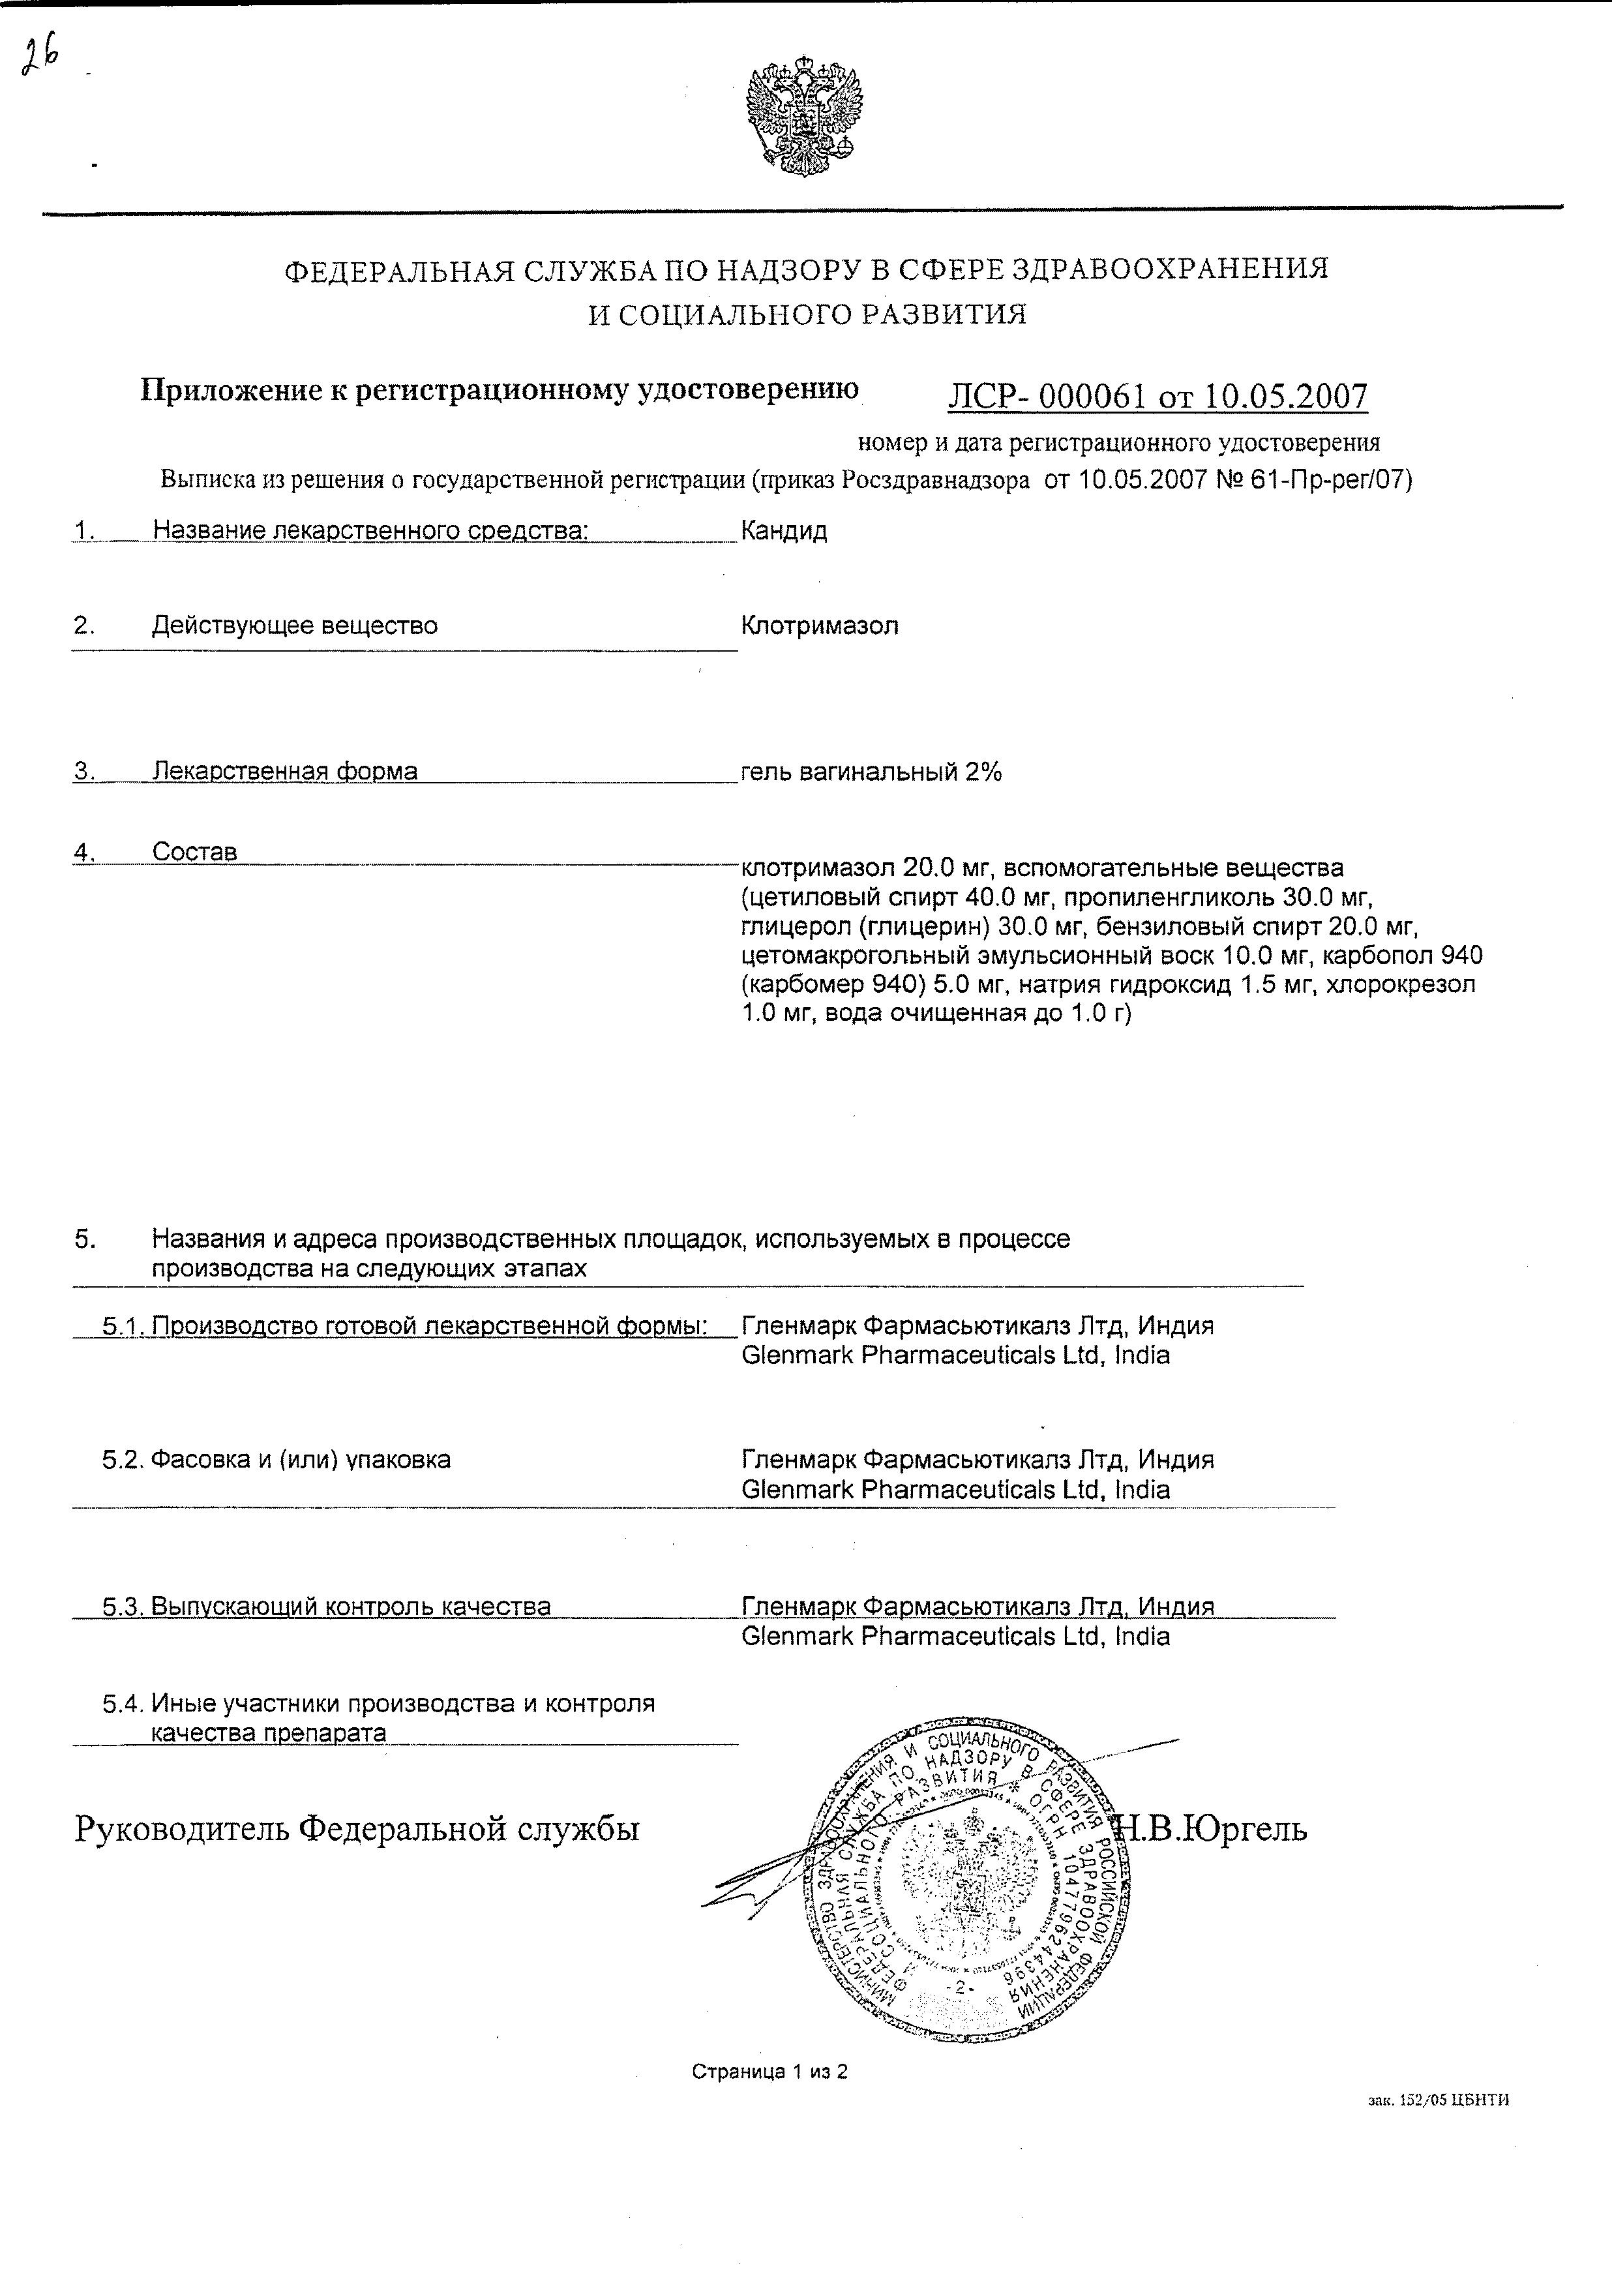 Кандид сертификат